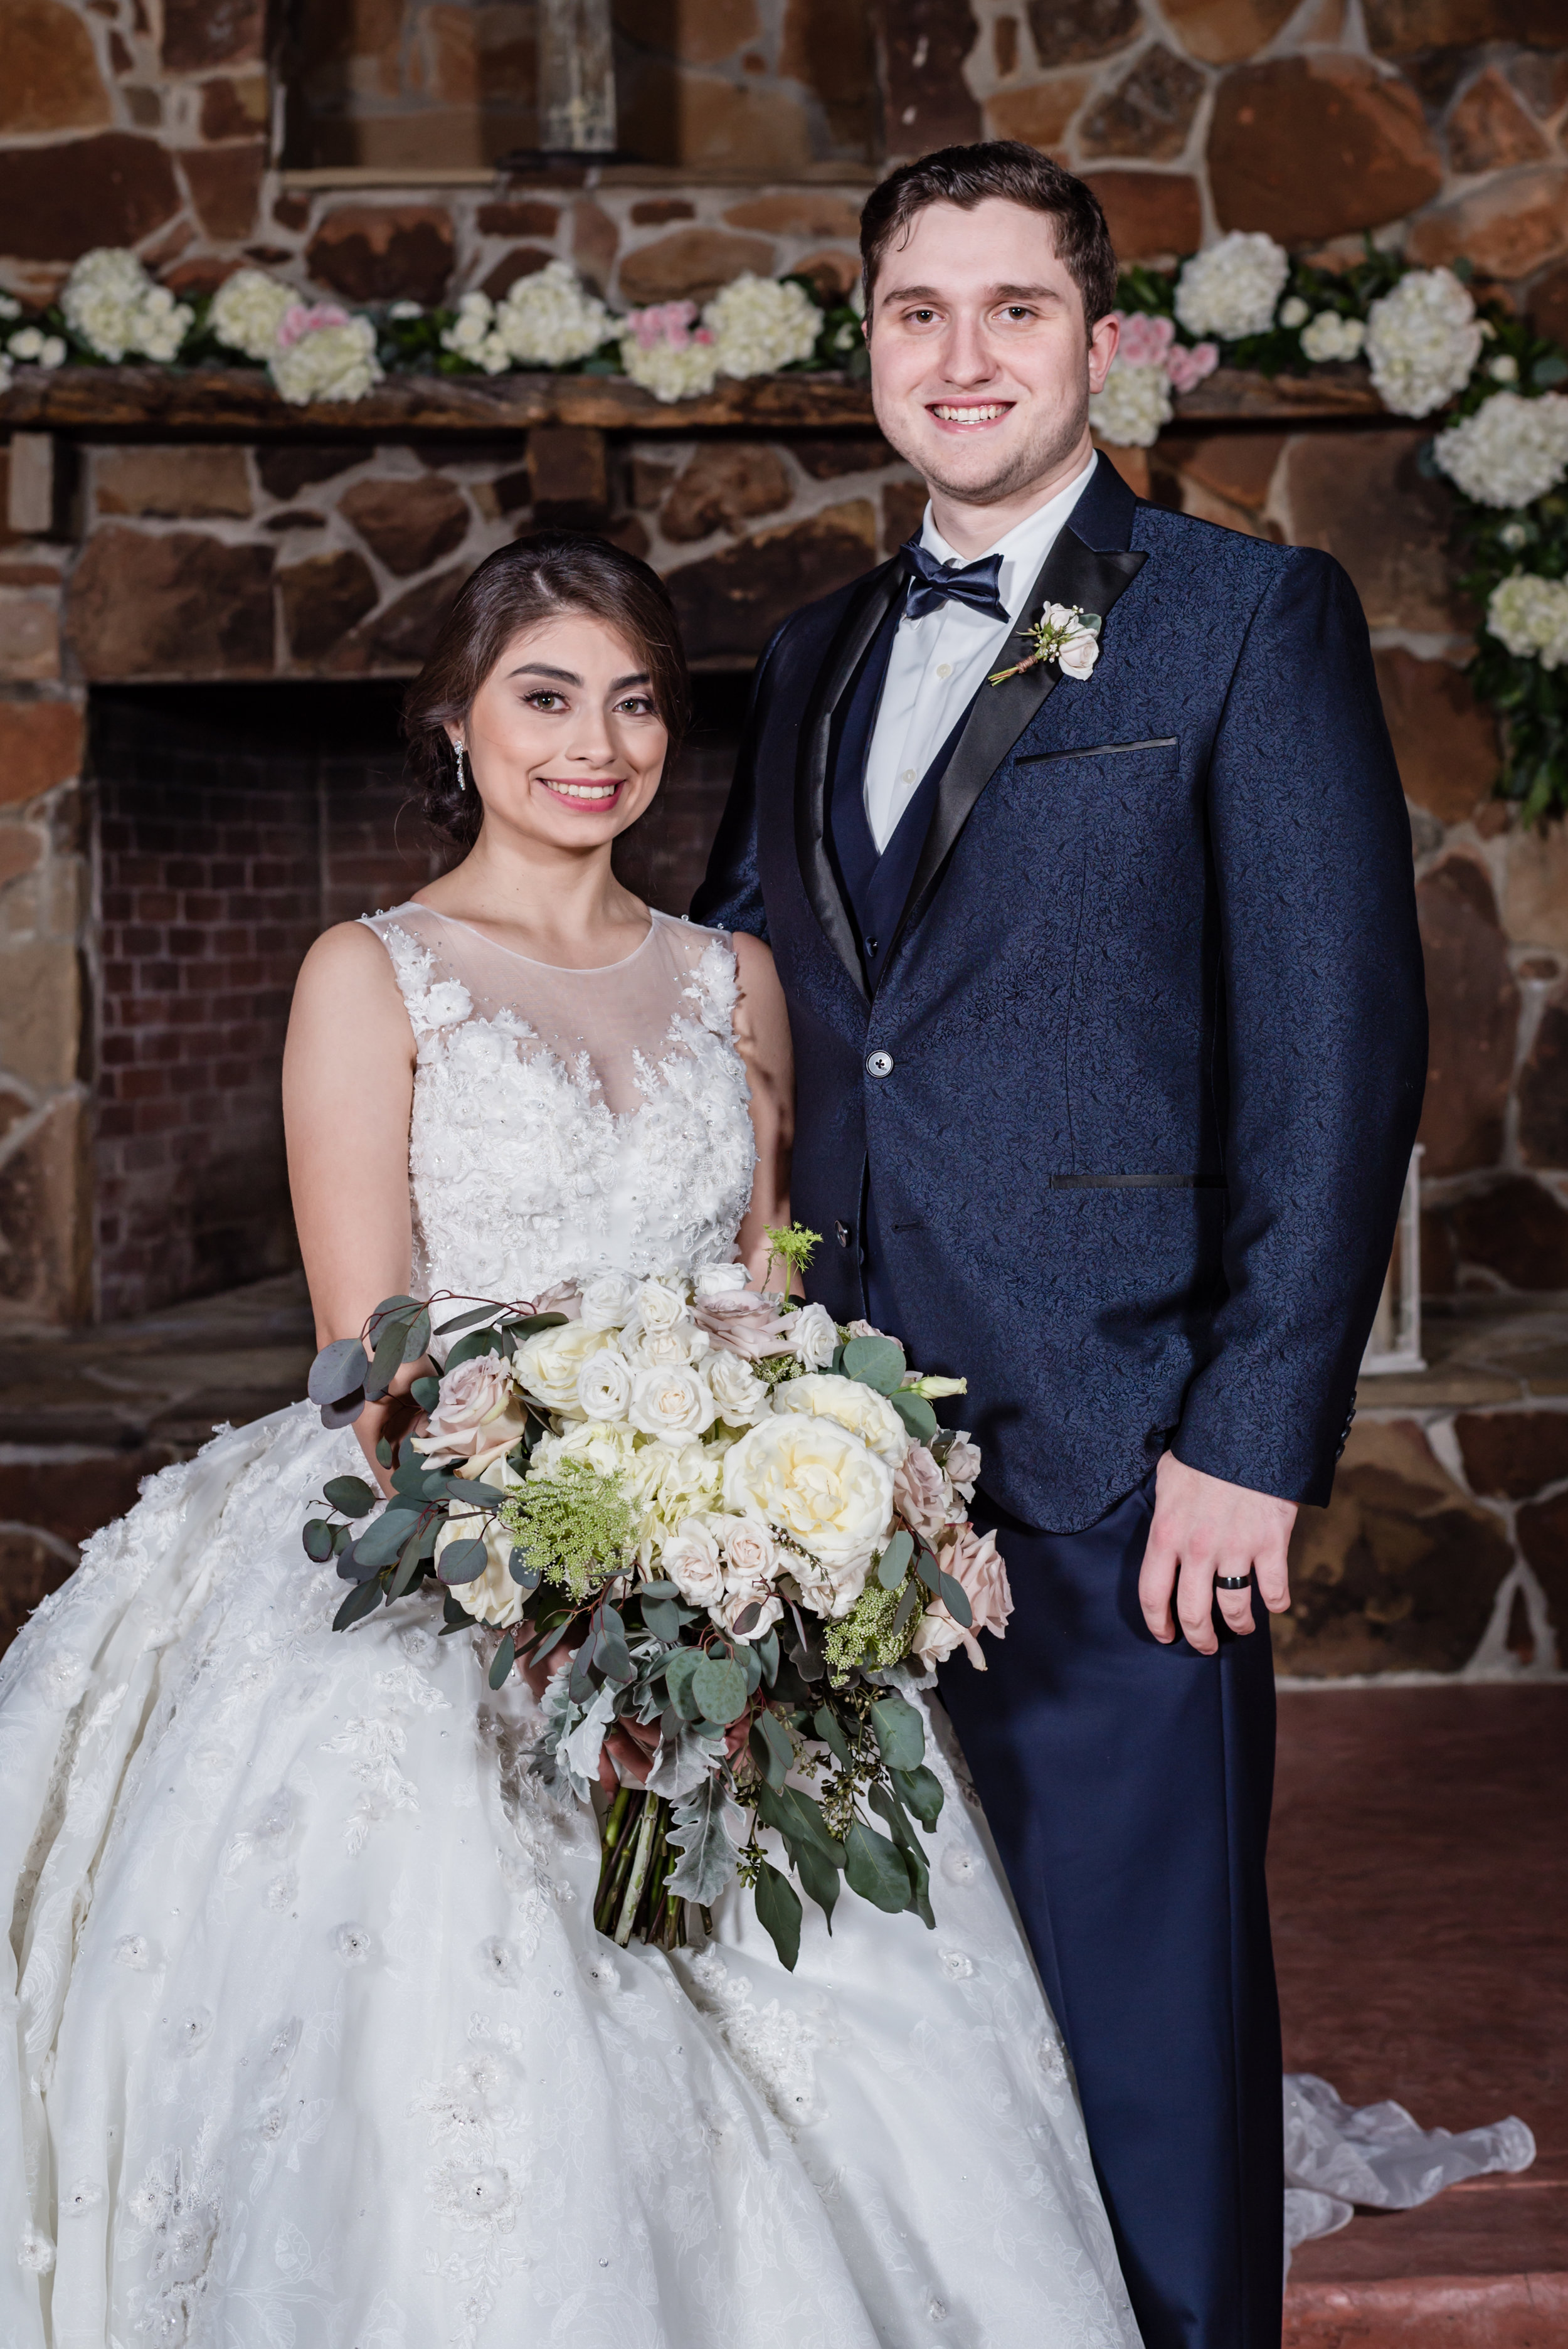 Jessica & Ethan - Madera estates- conroe, tx